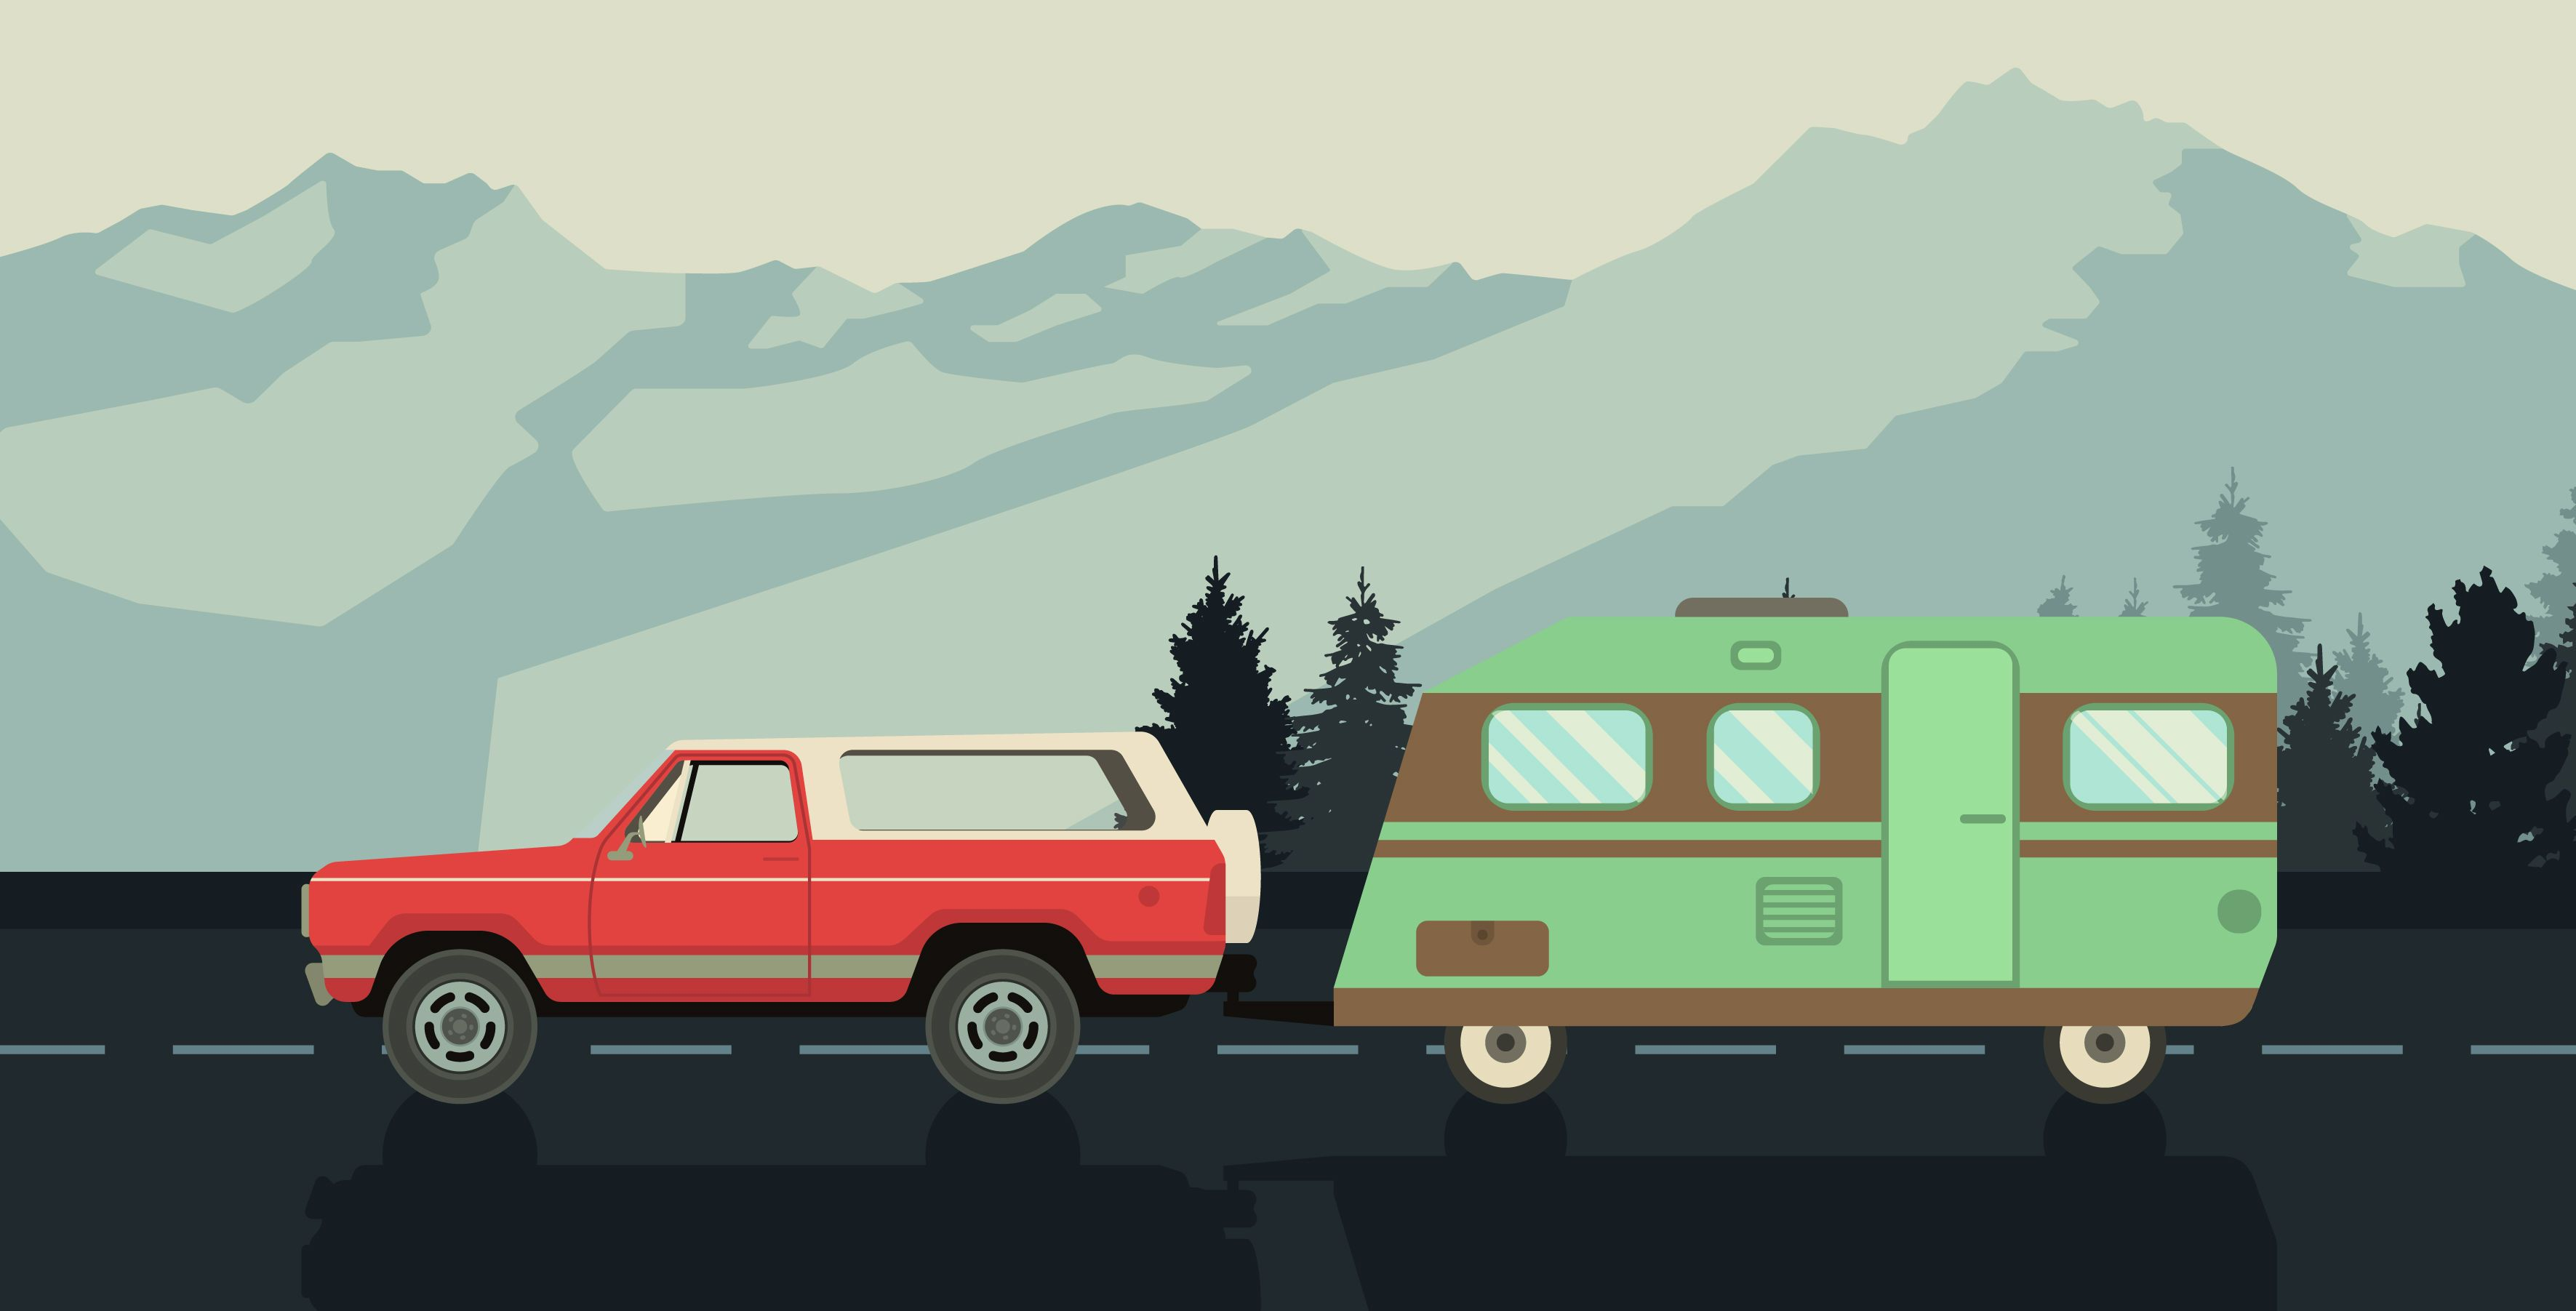 Road trip caravan illustration